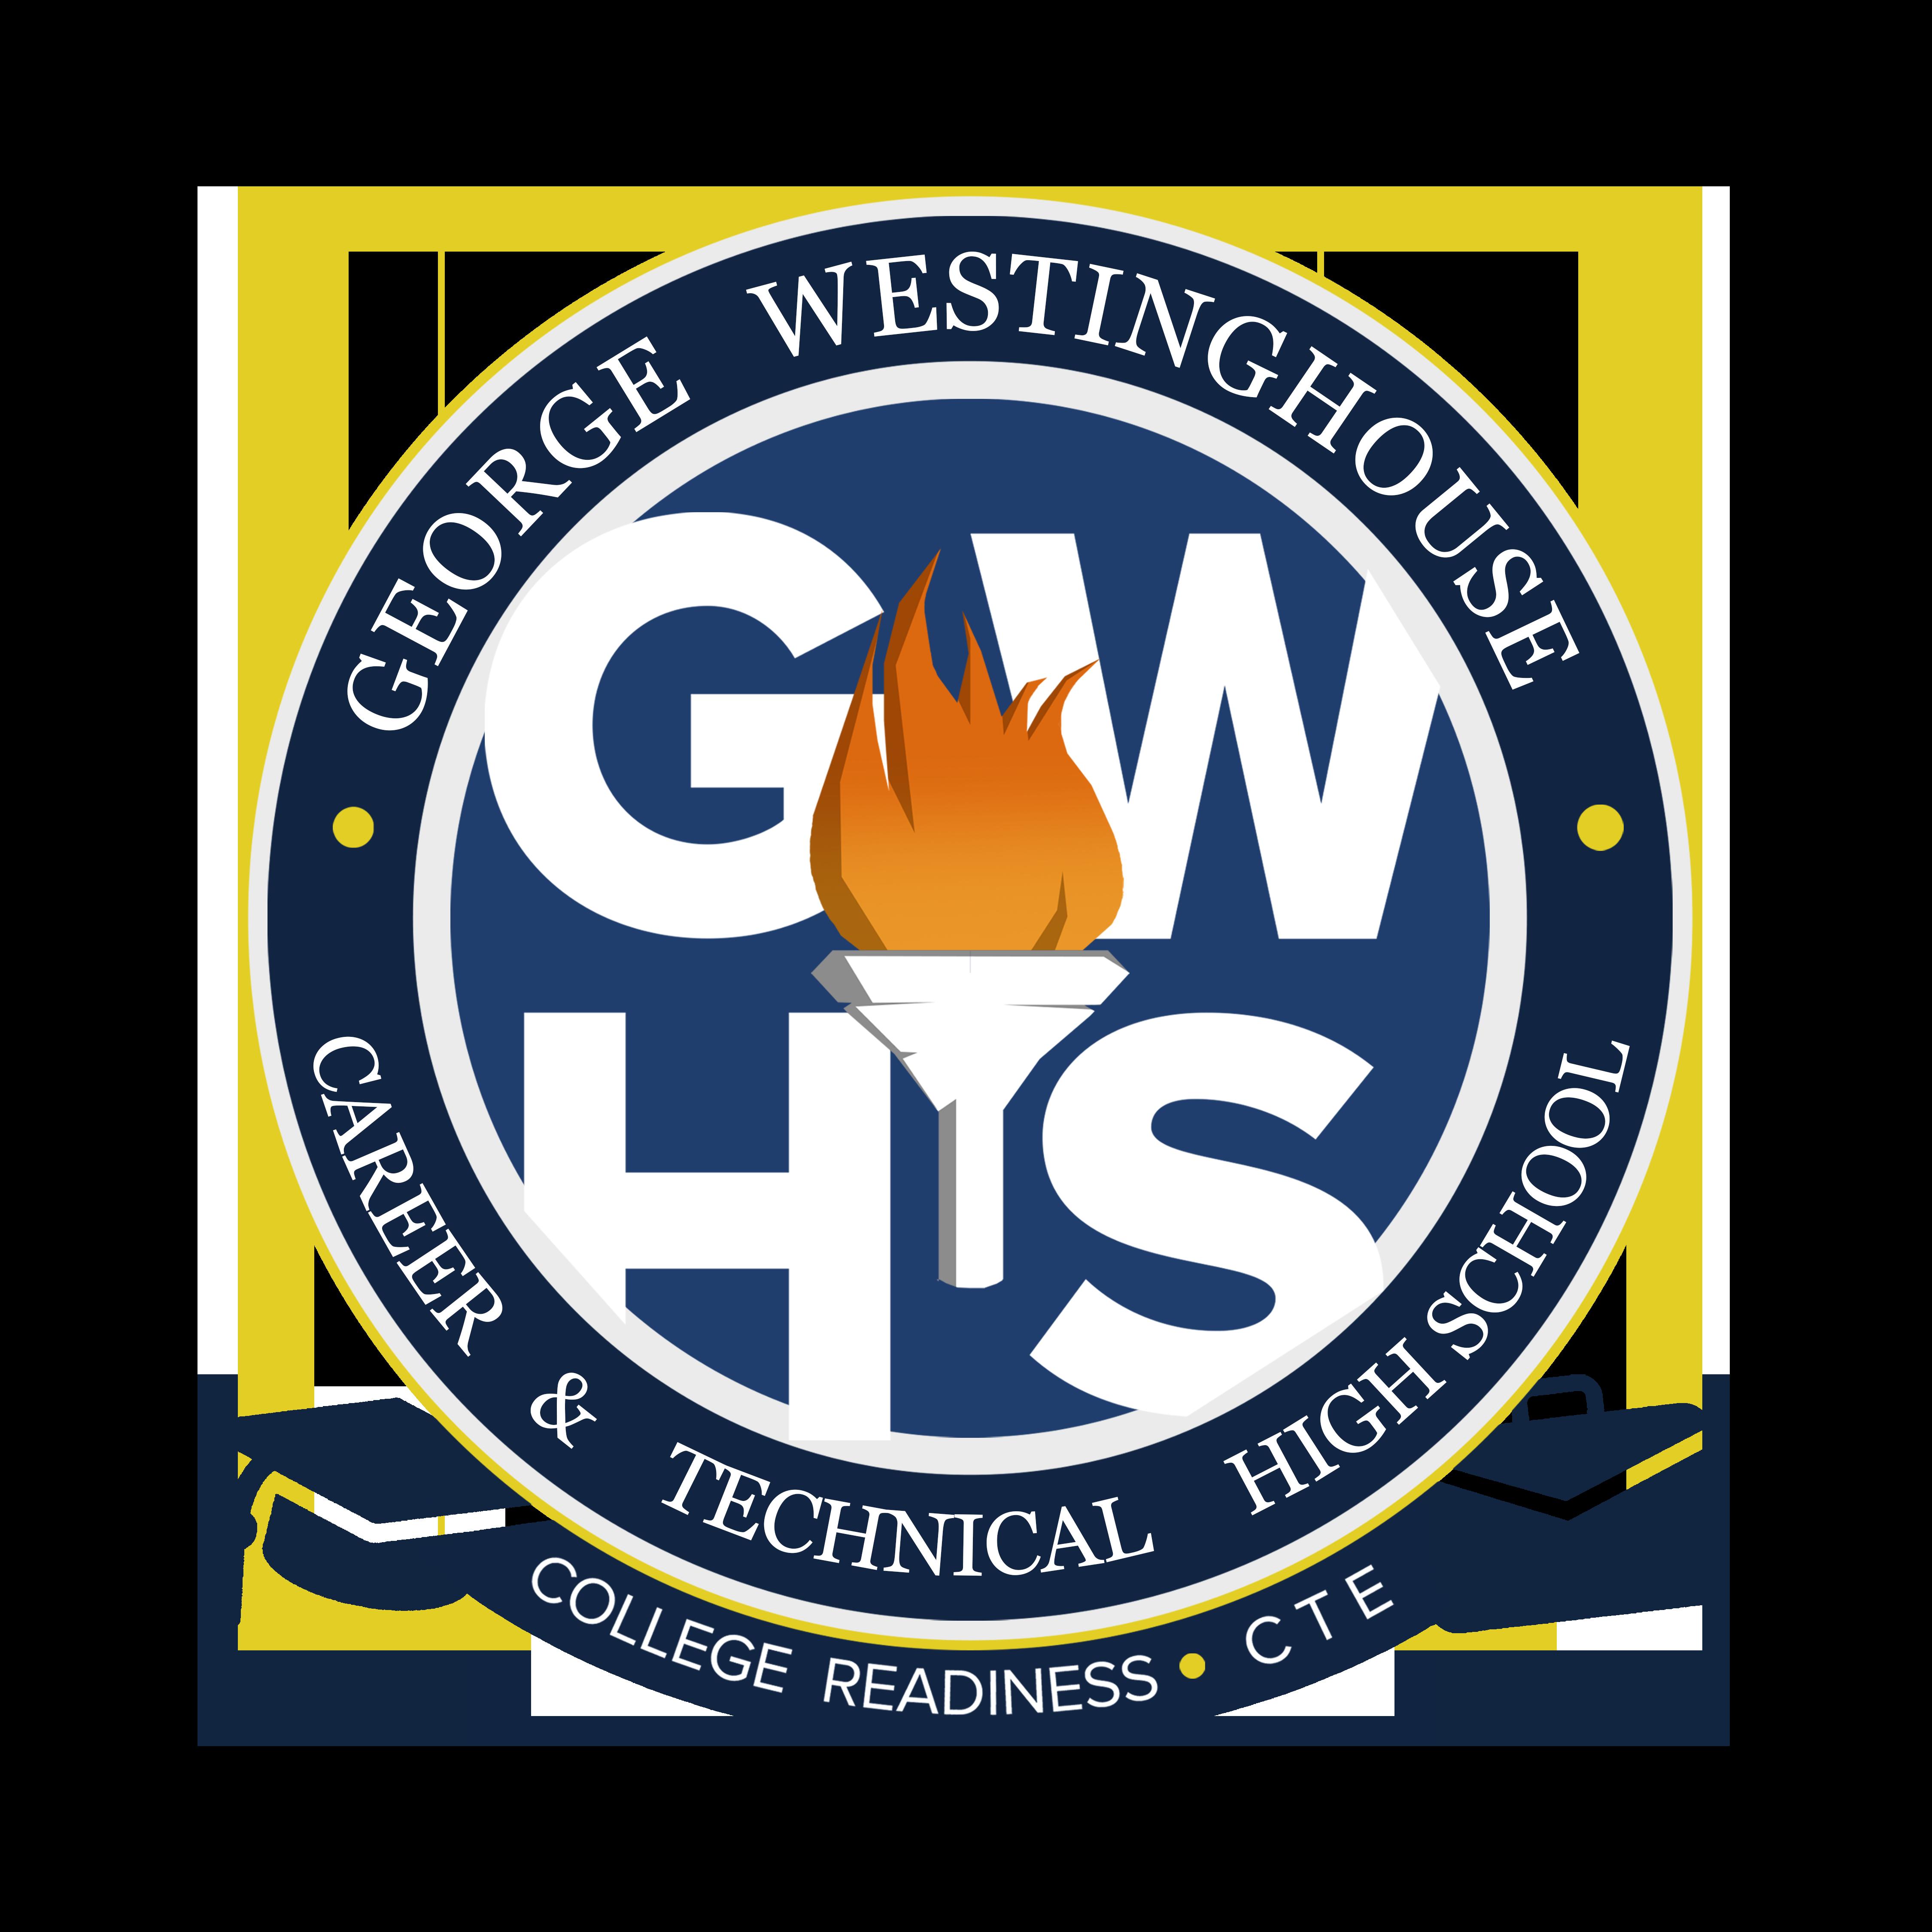 George Westinghouse High School